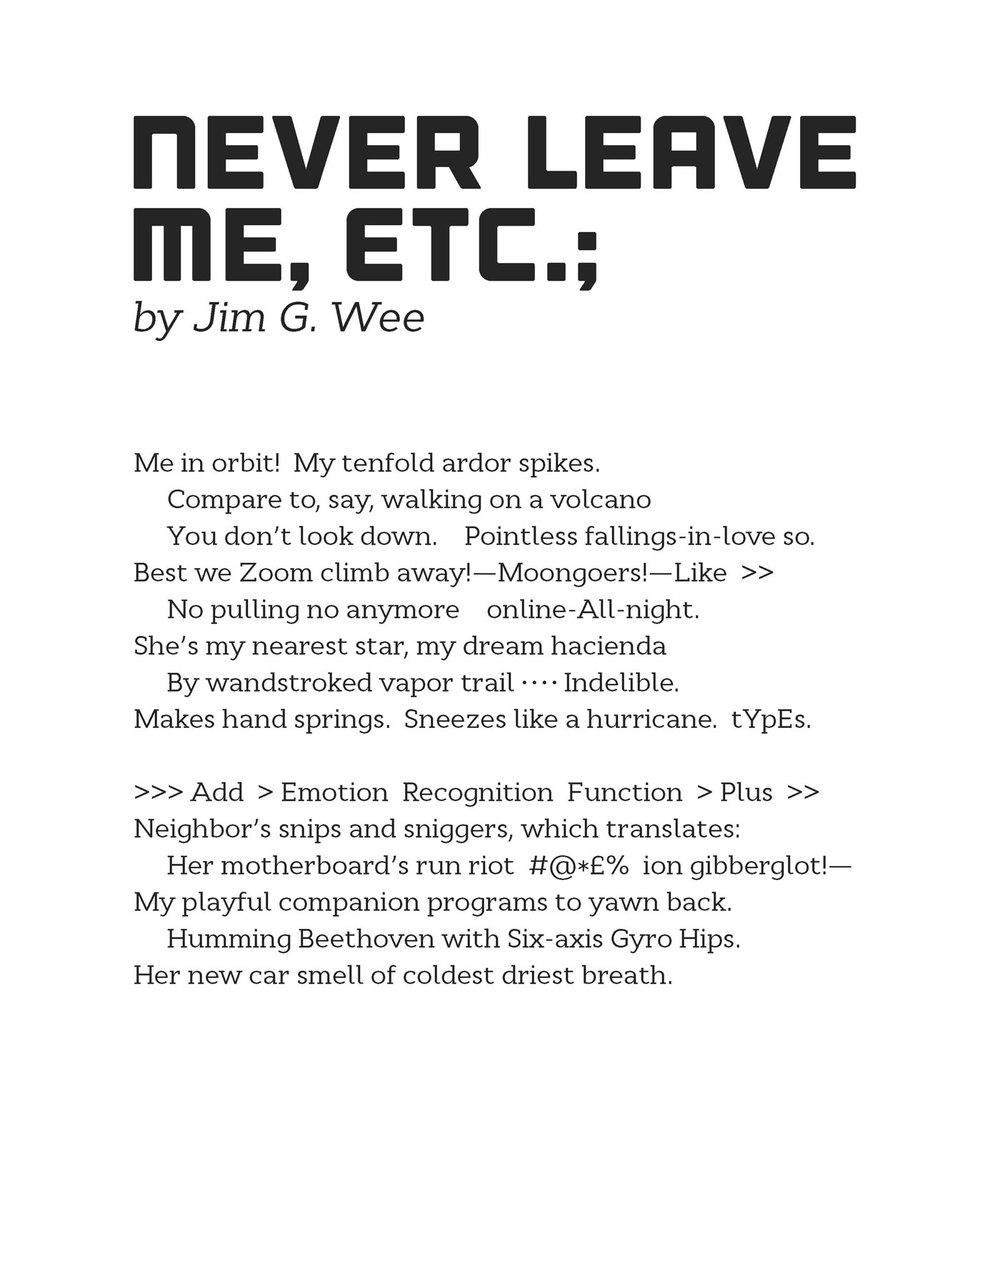 JimGWee_NeverLeaveMeEtc.jpg